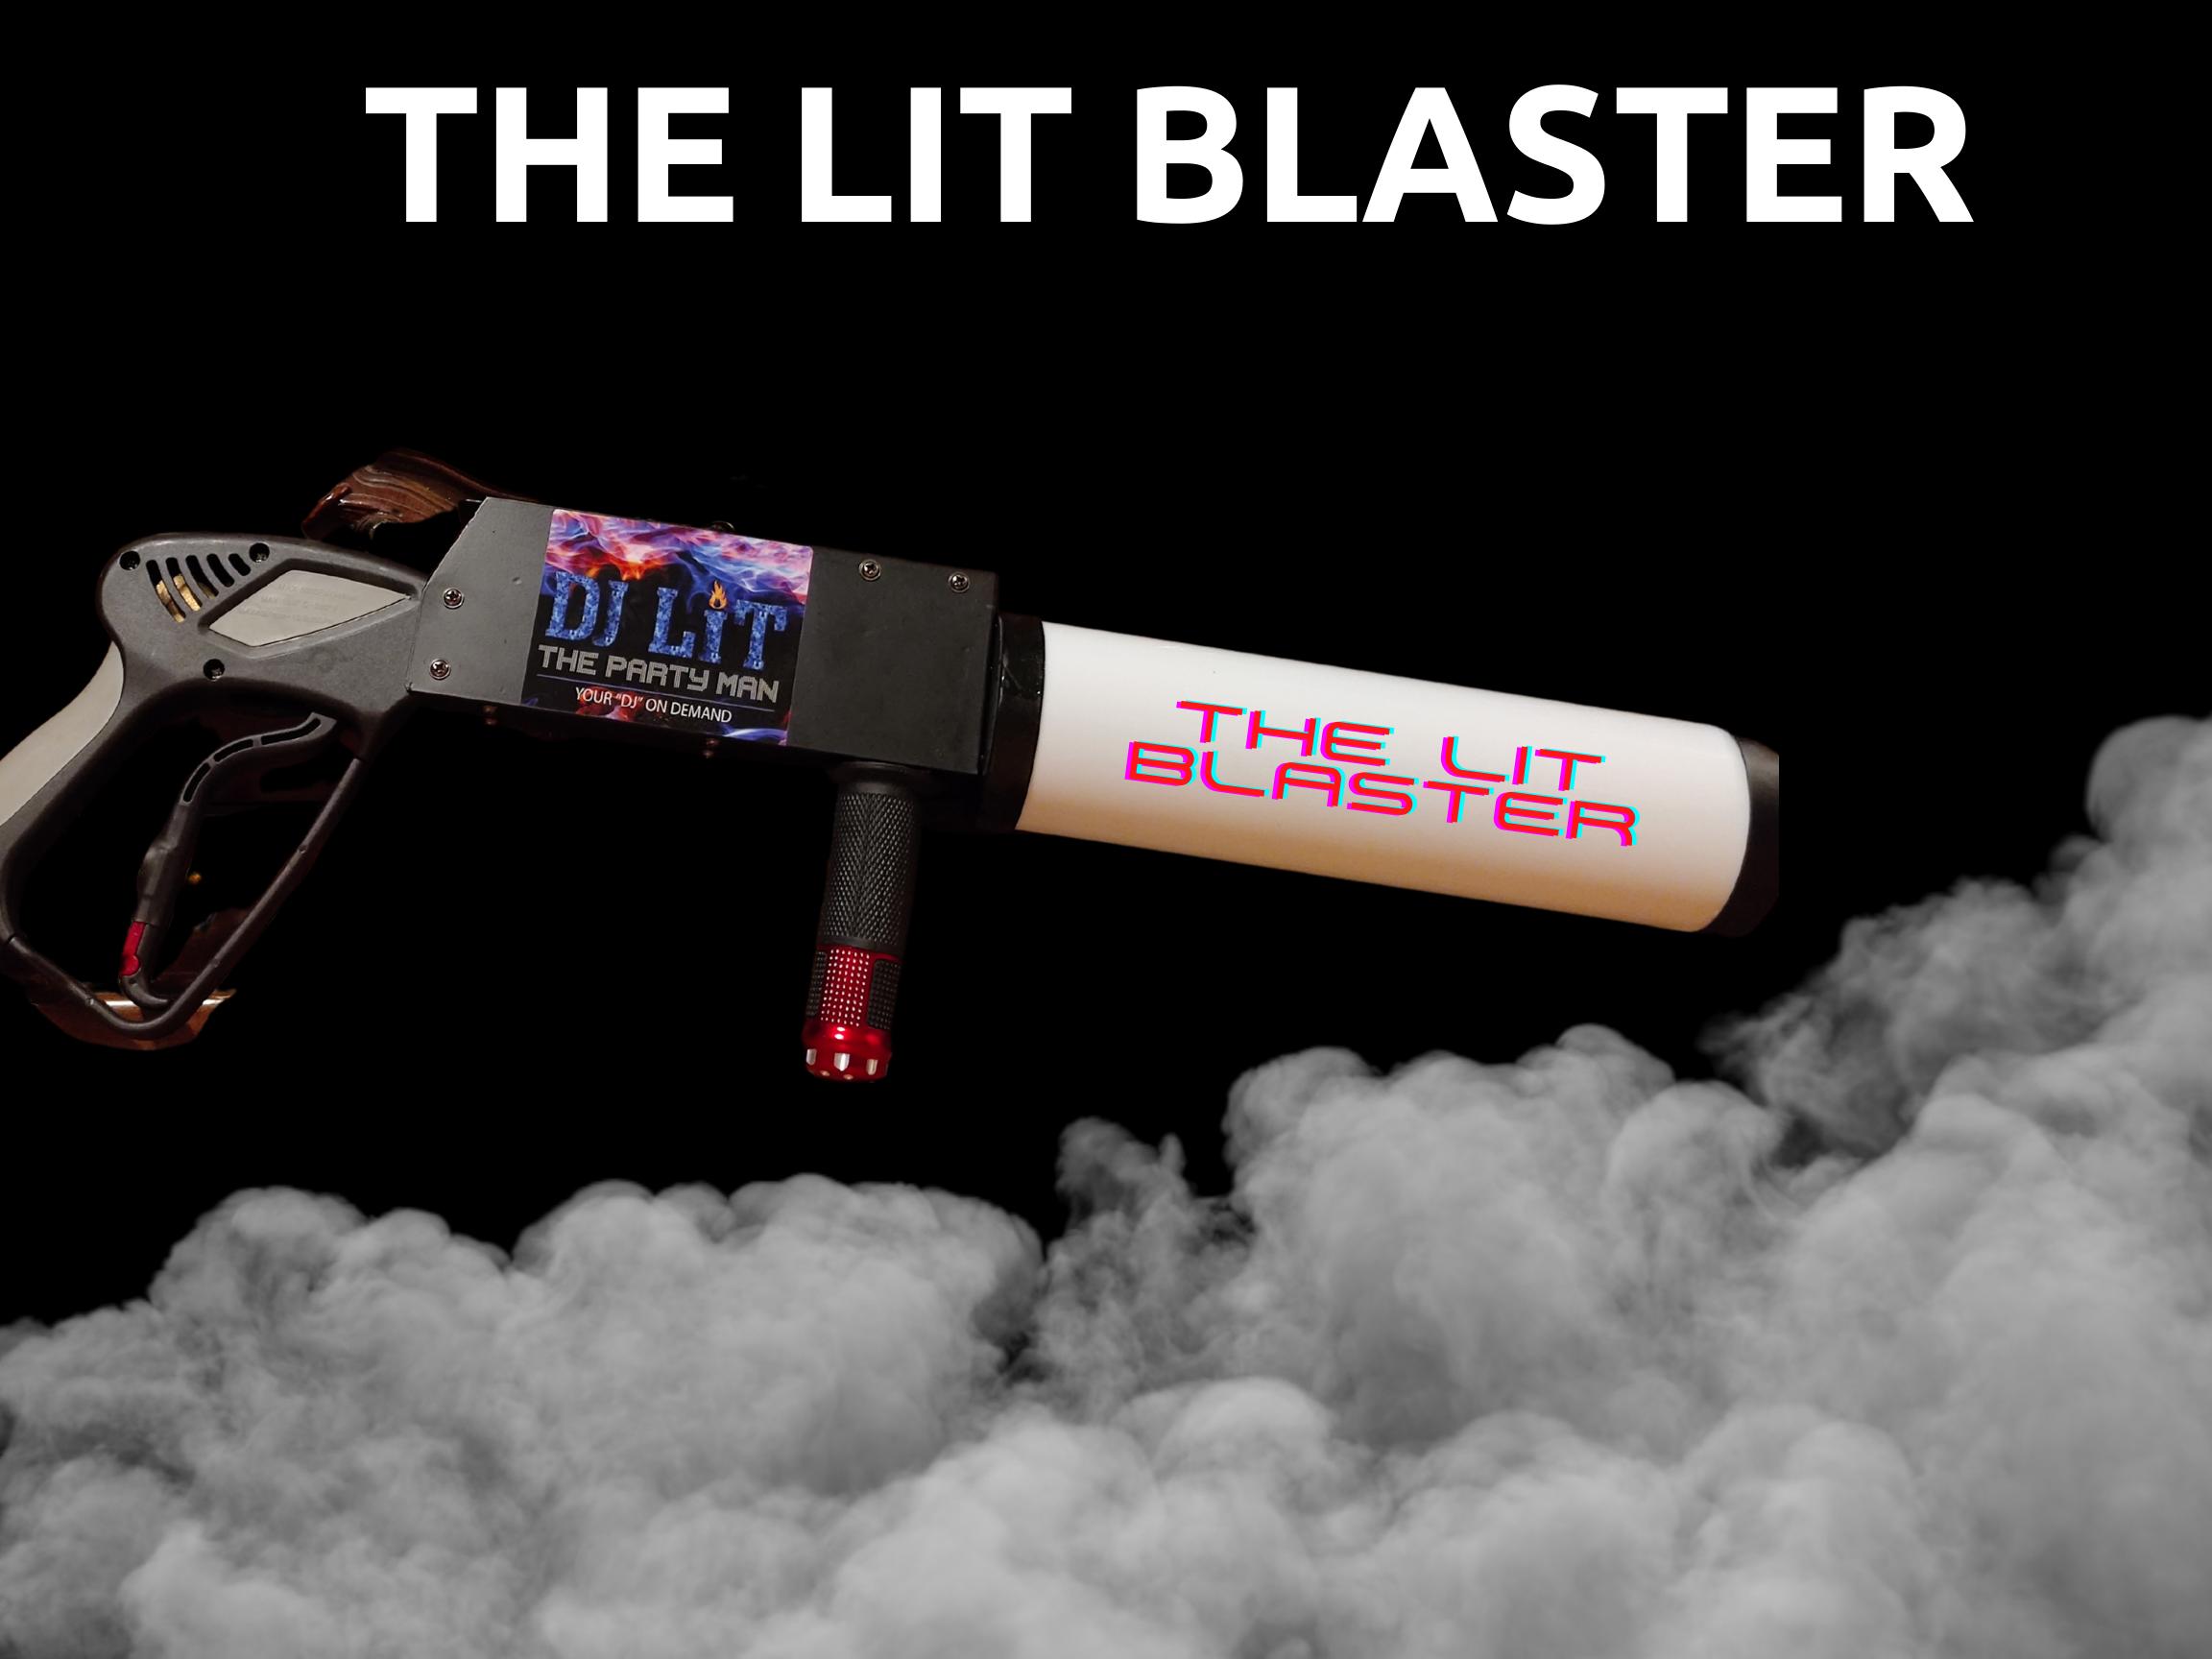 The Lit Blaster